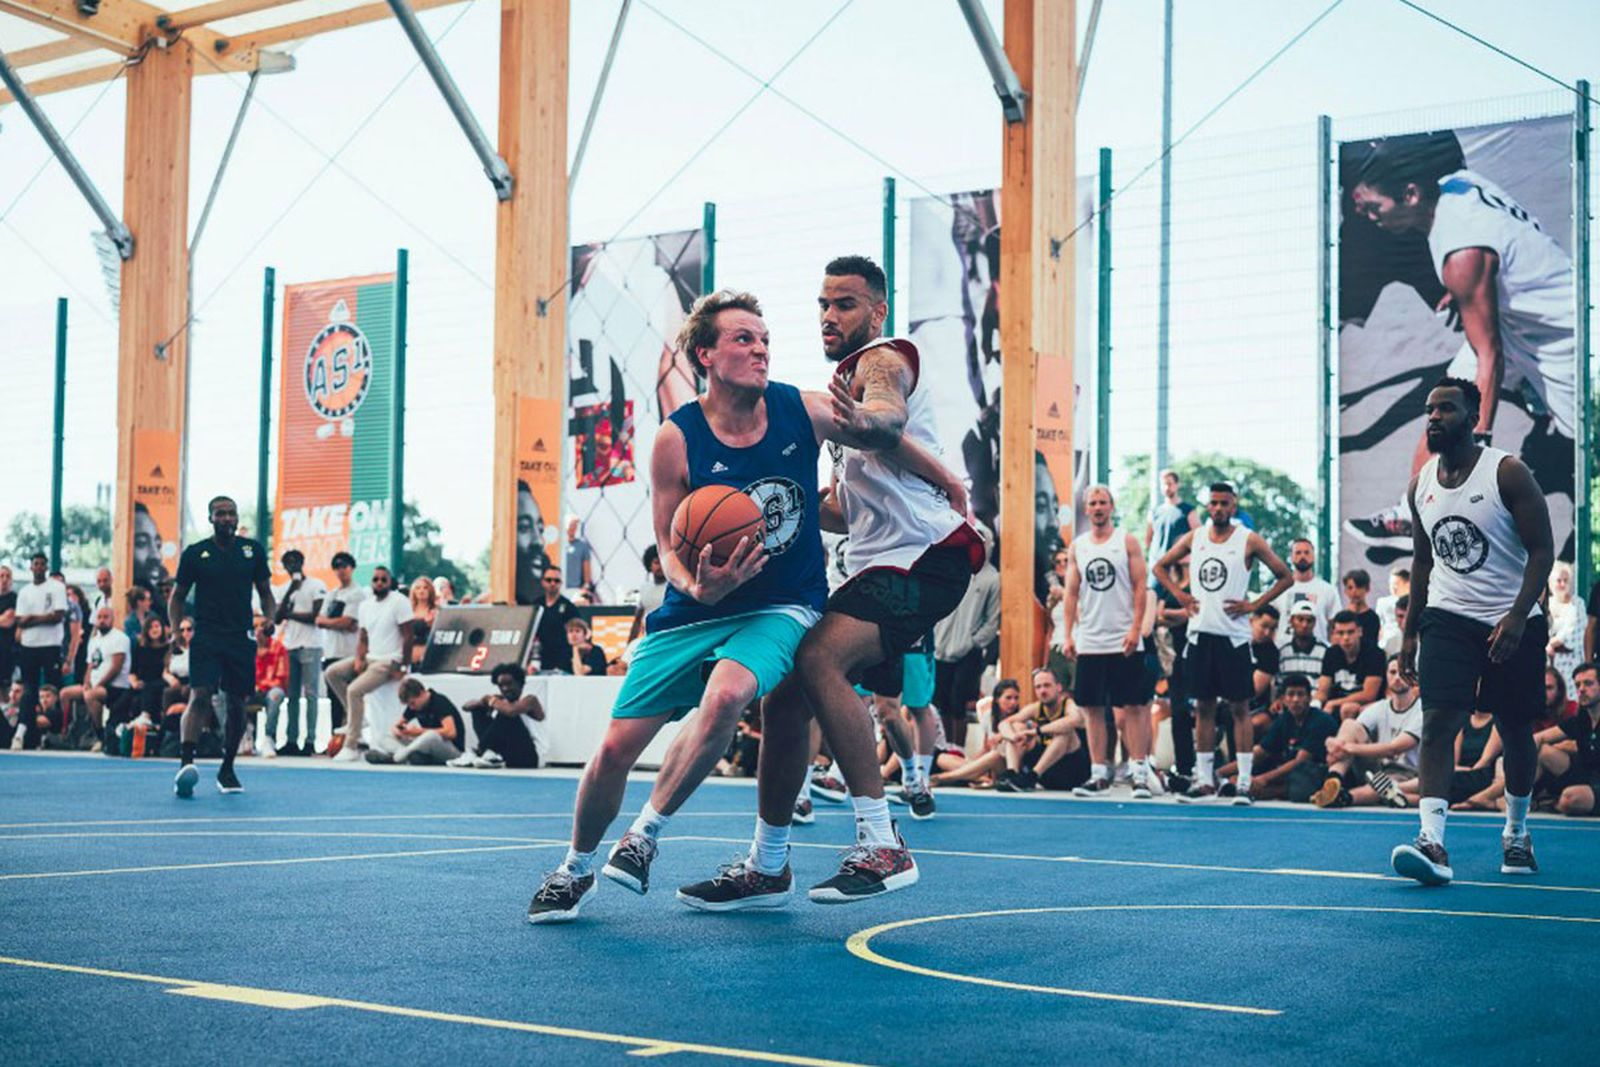 adidas streetball tour berlin kristaps porzingis adidas Harden Vol. 2 kickz nba